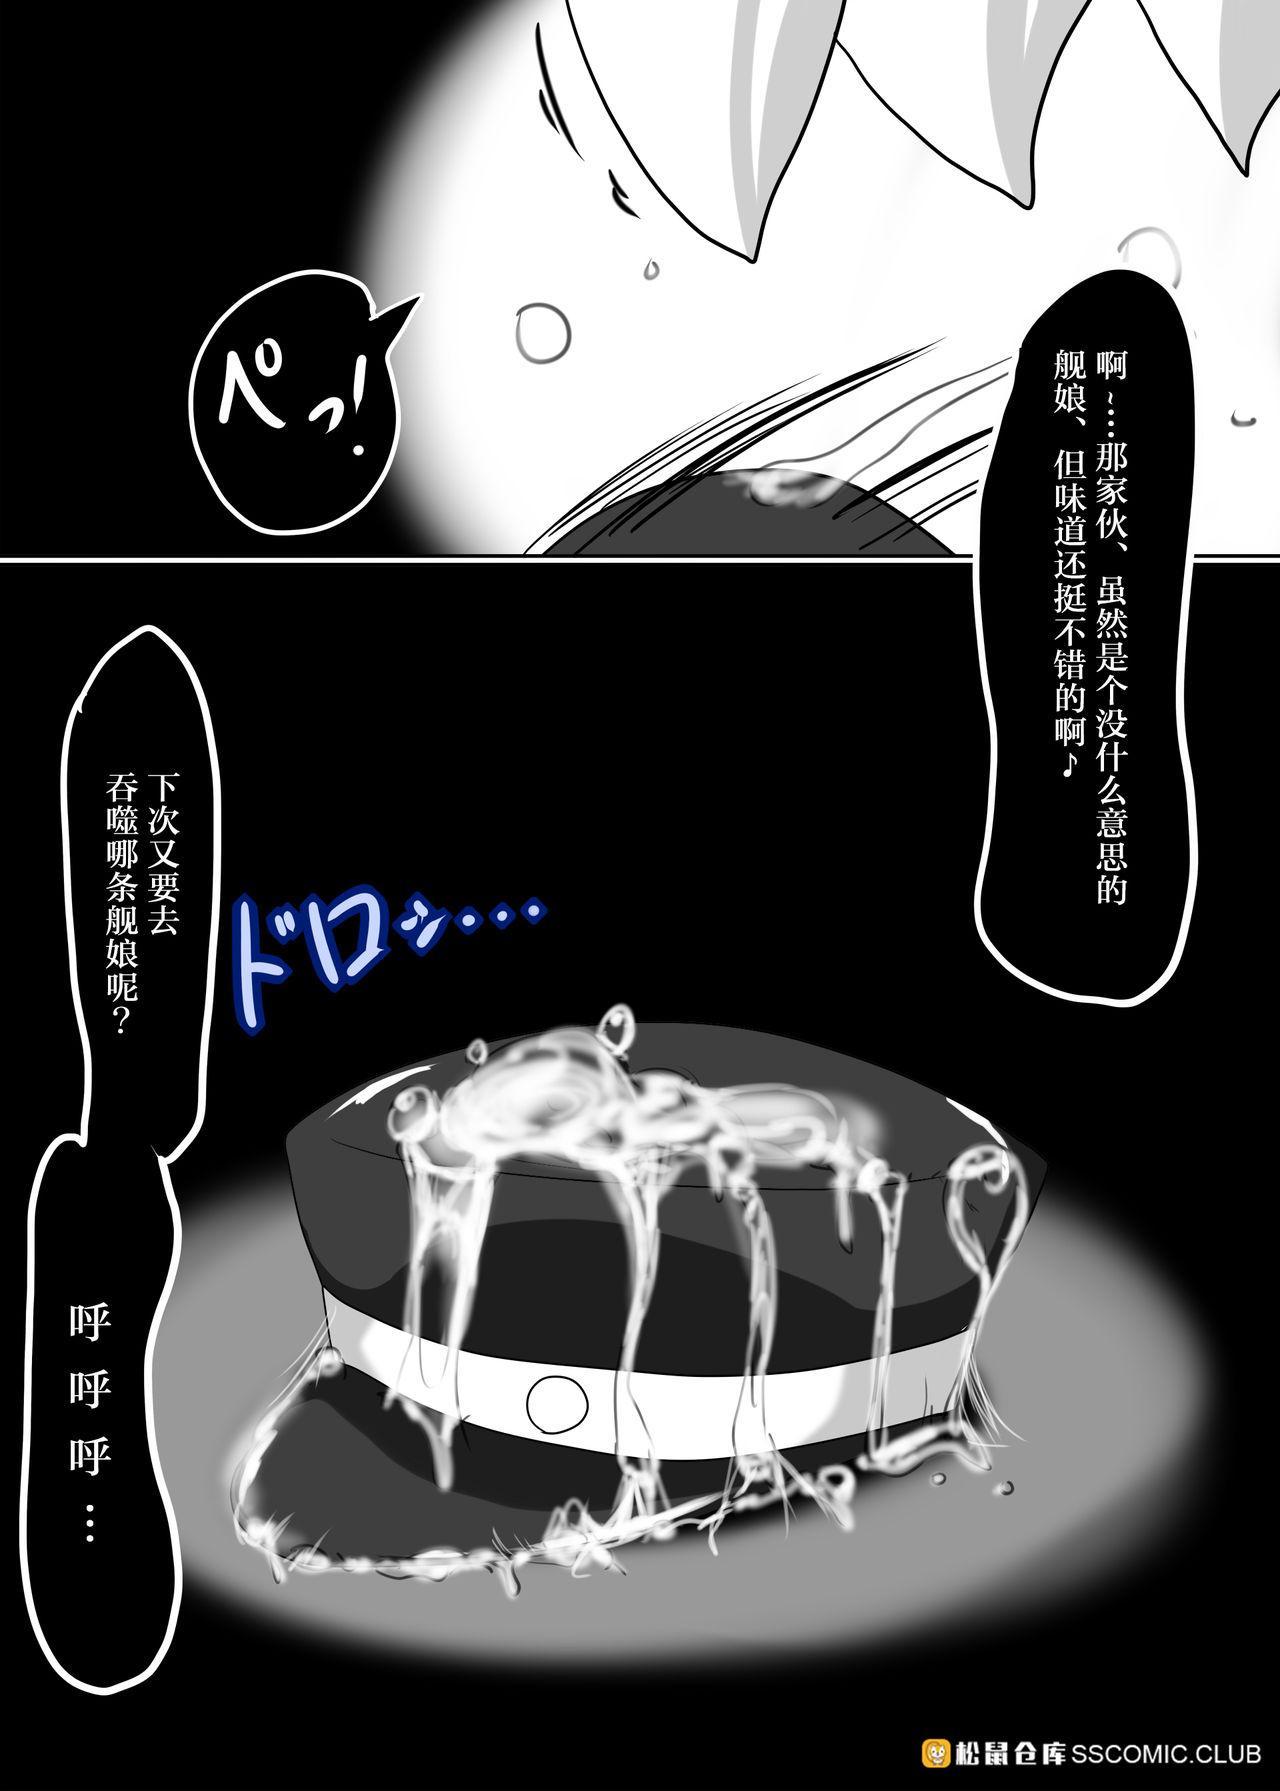 Senkan Re-kyuu no Kindaika Kaishuu 24